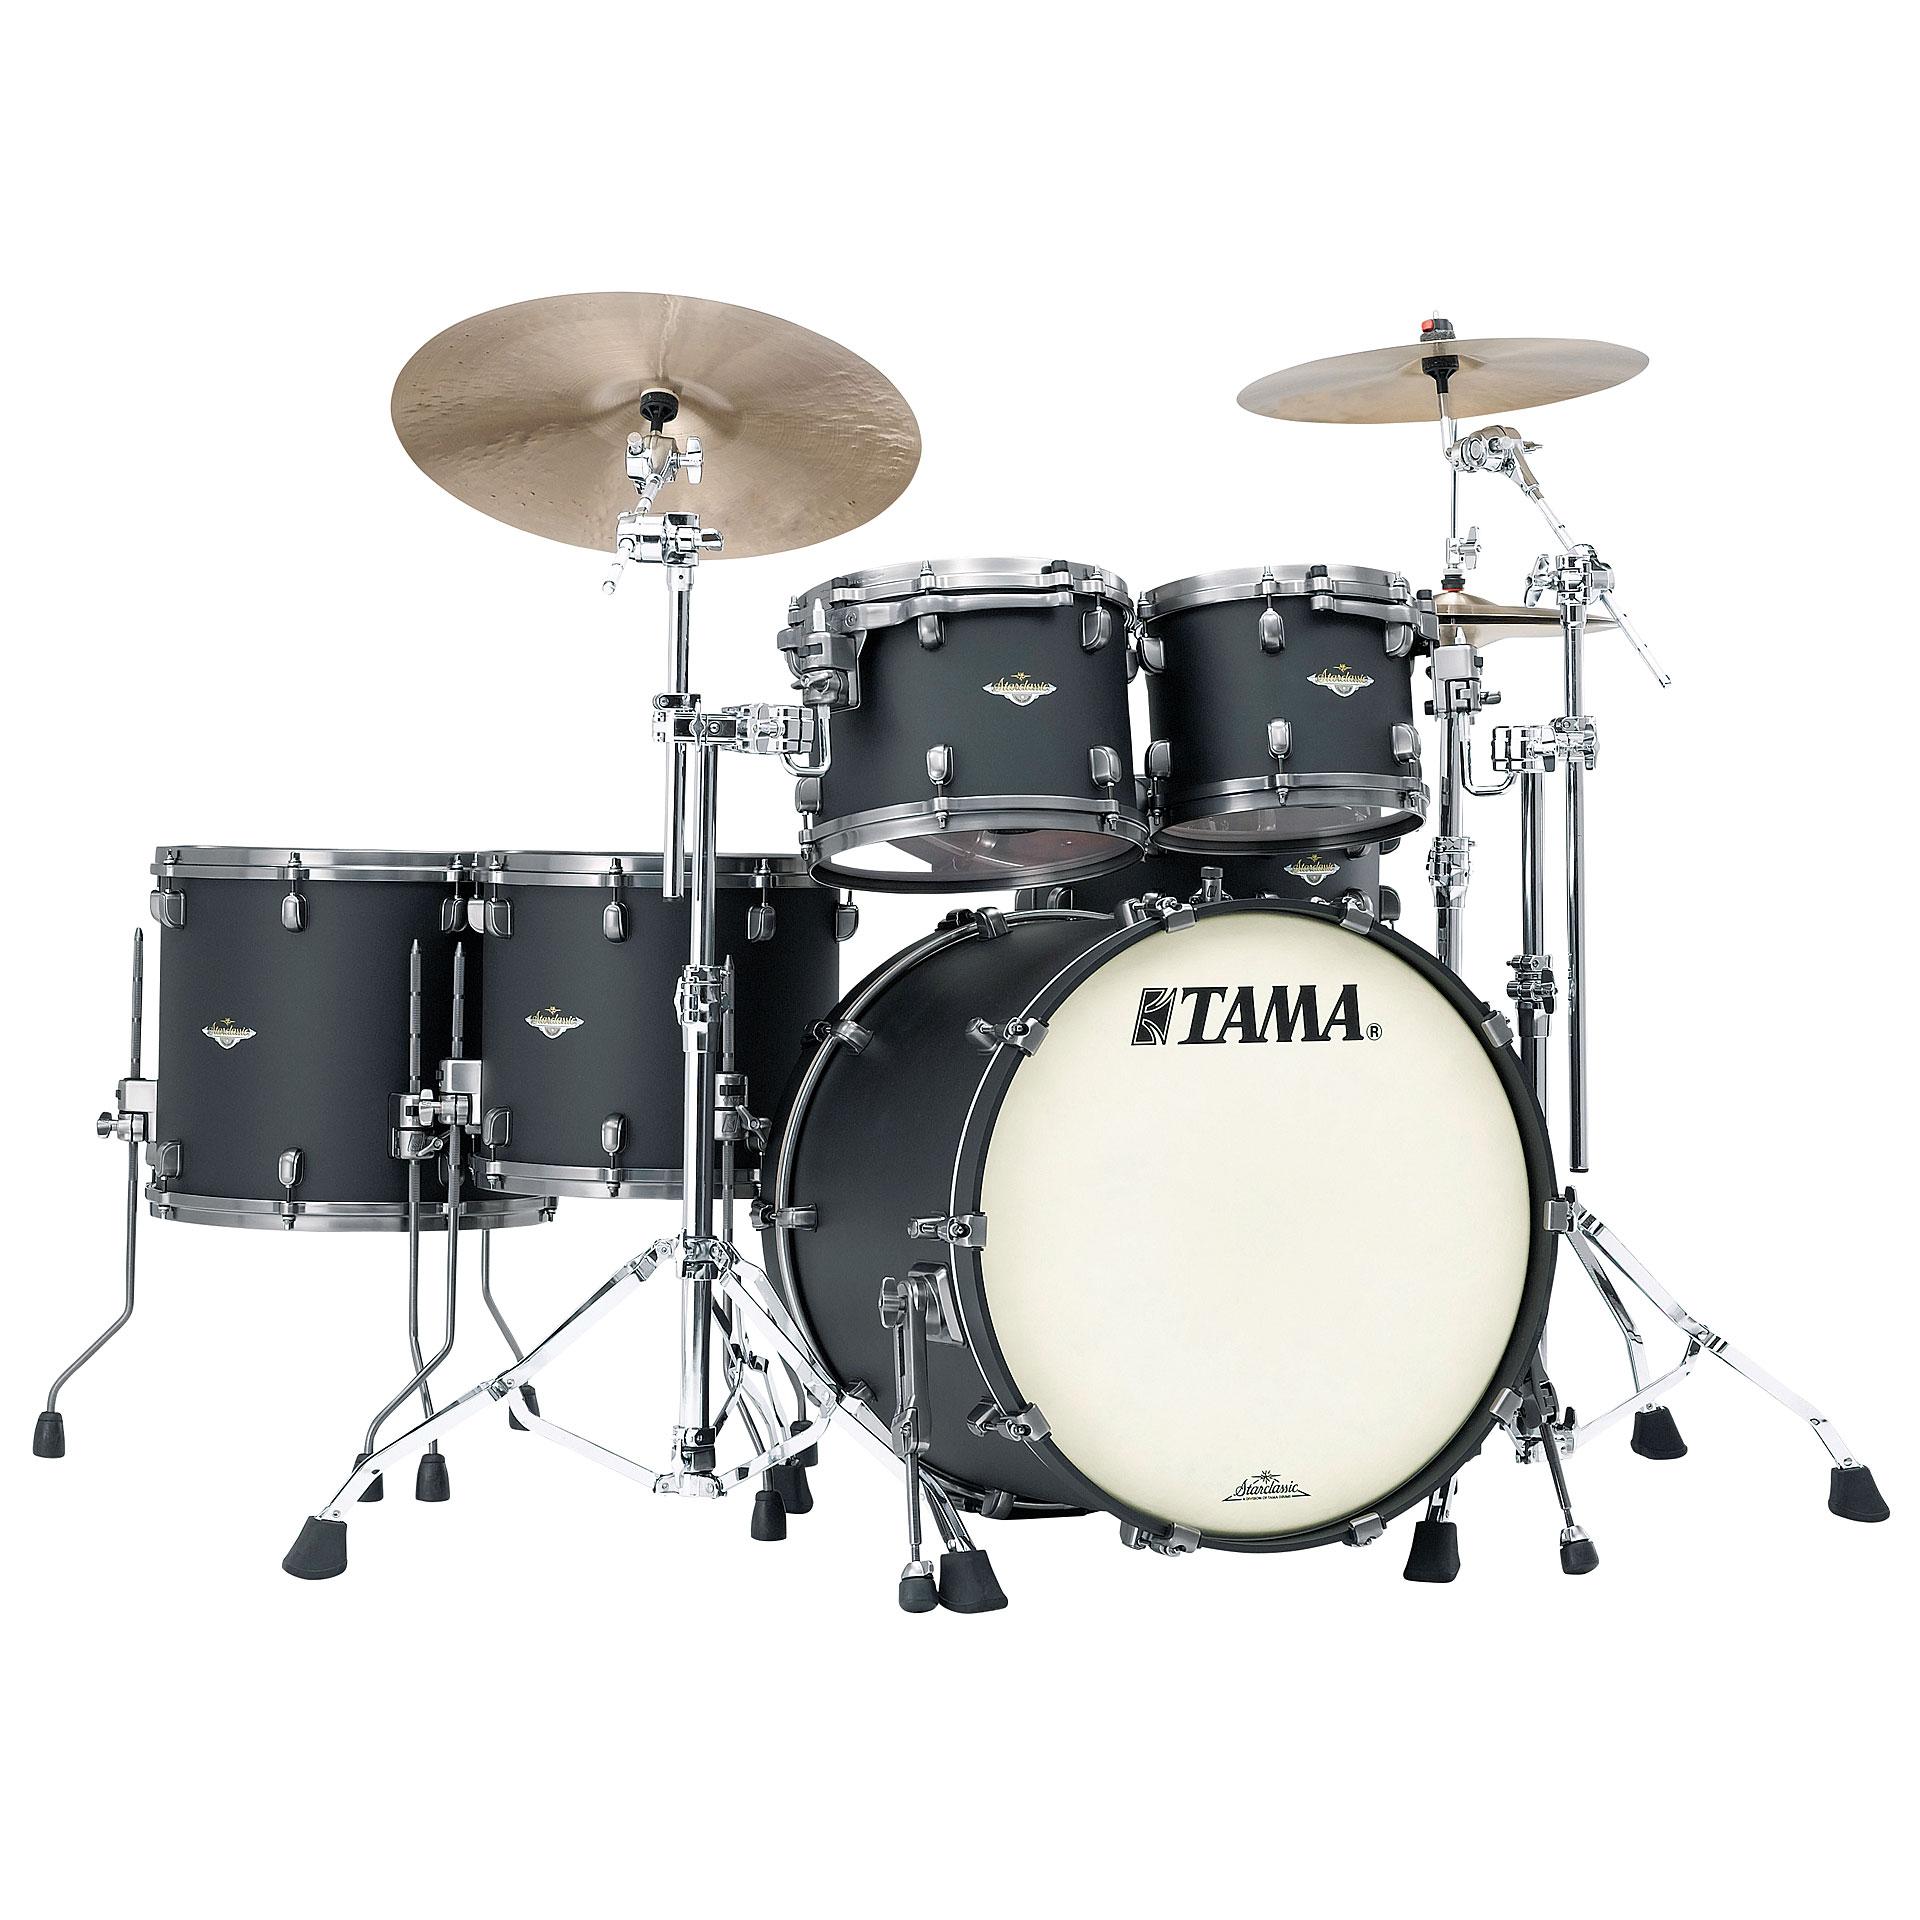 tama starclassic bubinga 22 flat black drum kit. Black Bedroom Furniture Sets. Home Design Ideas